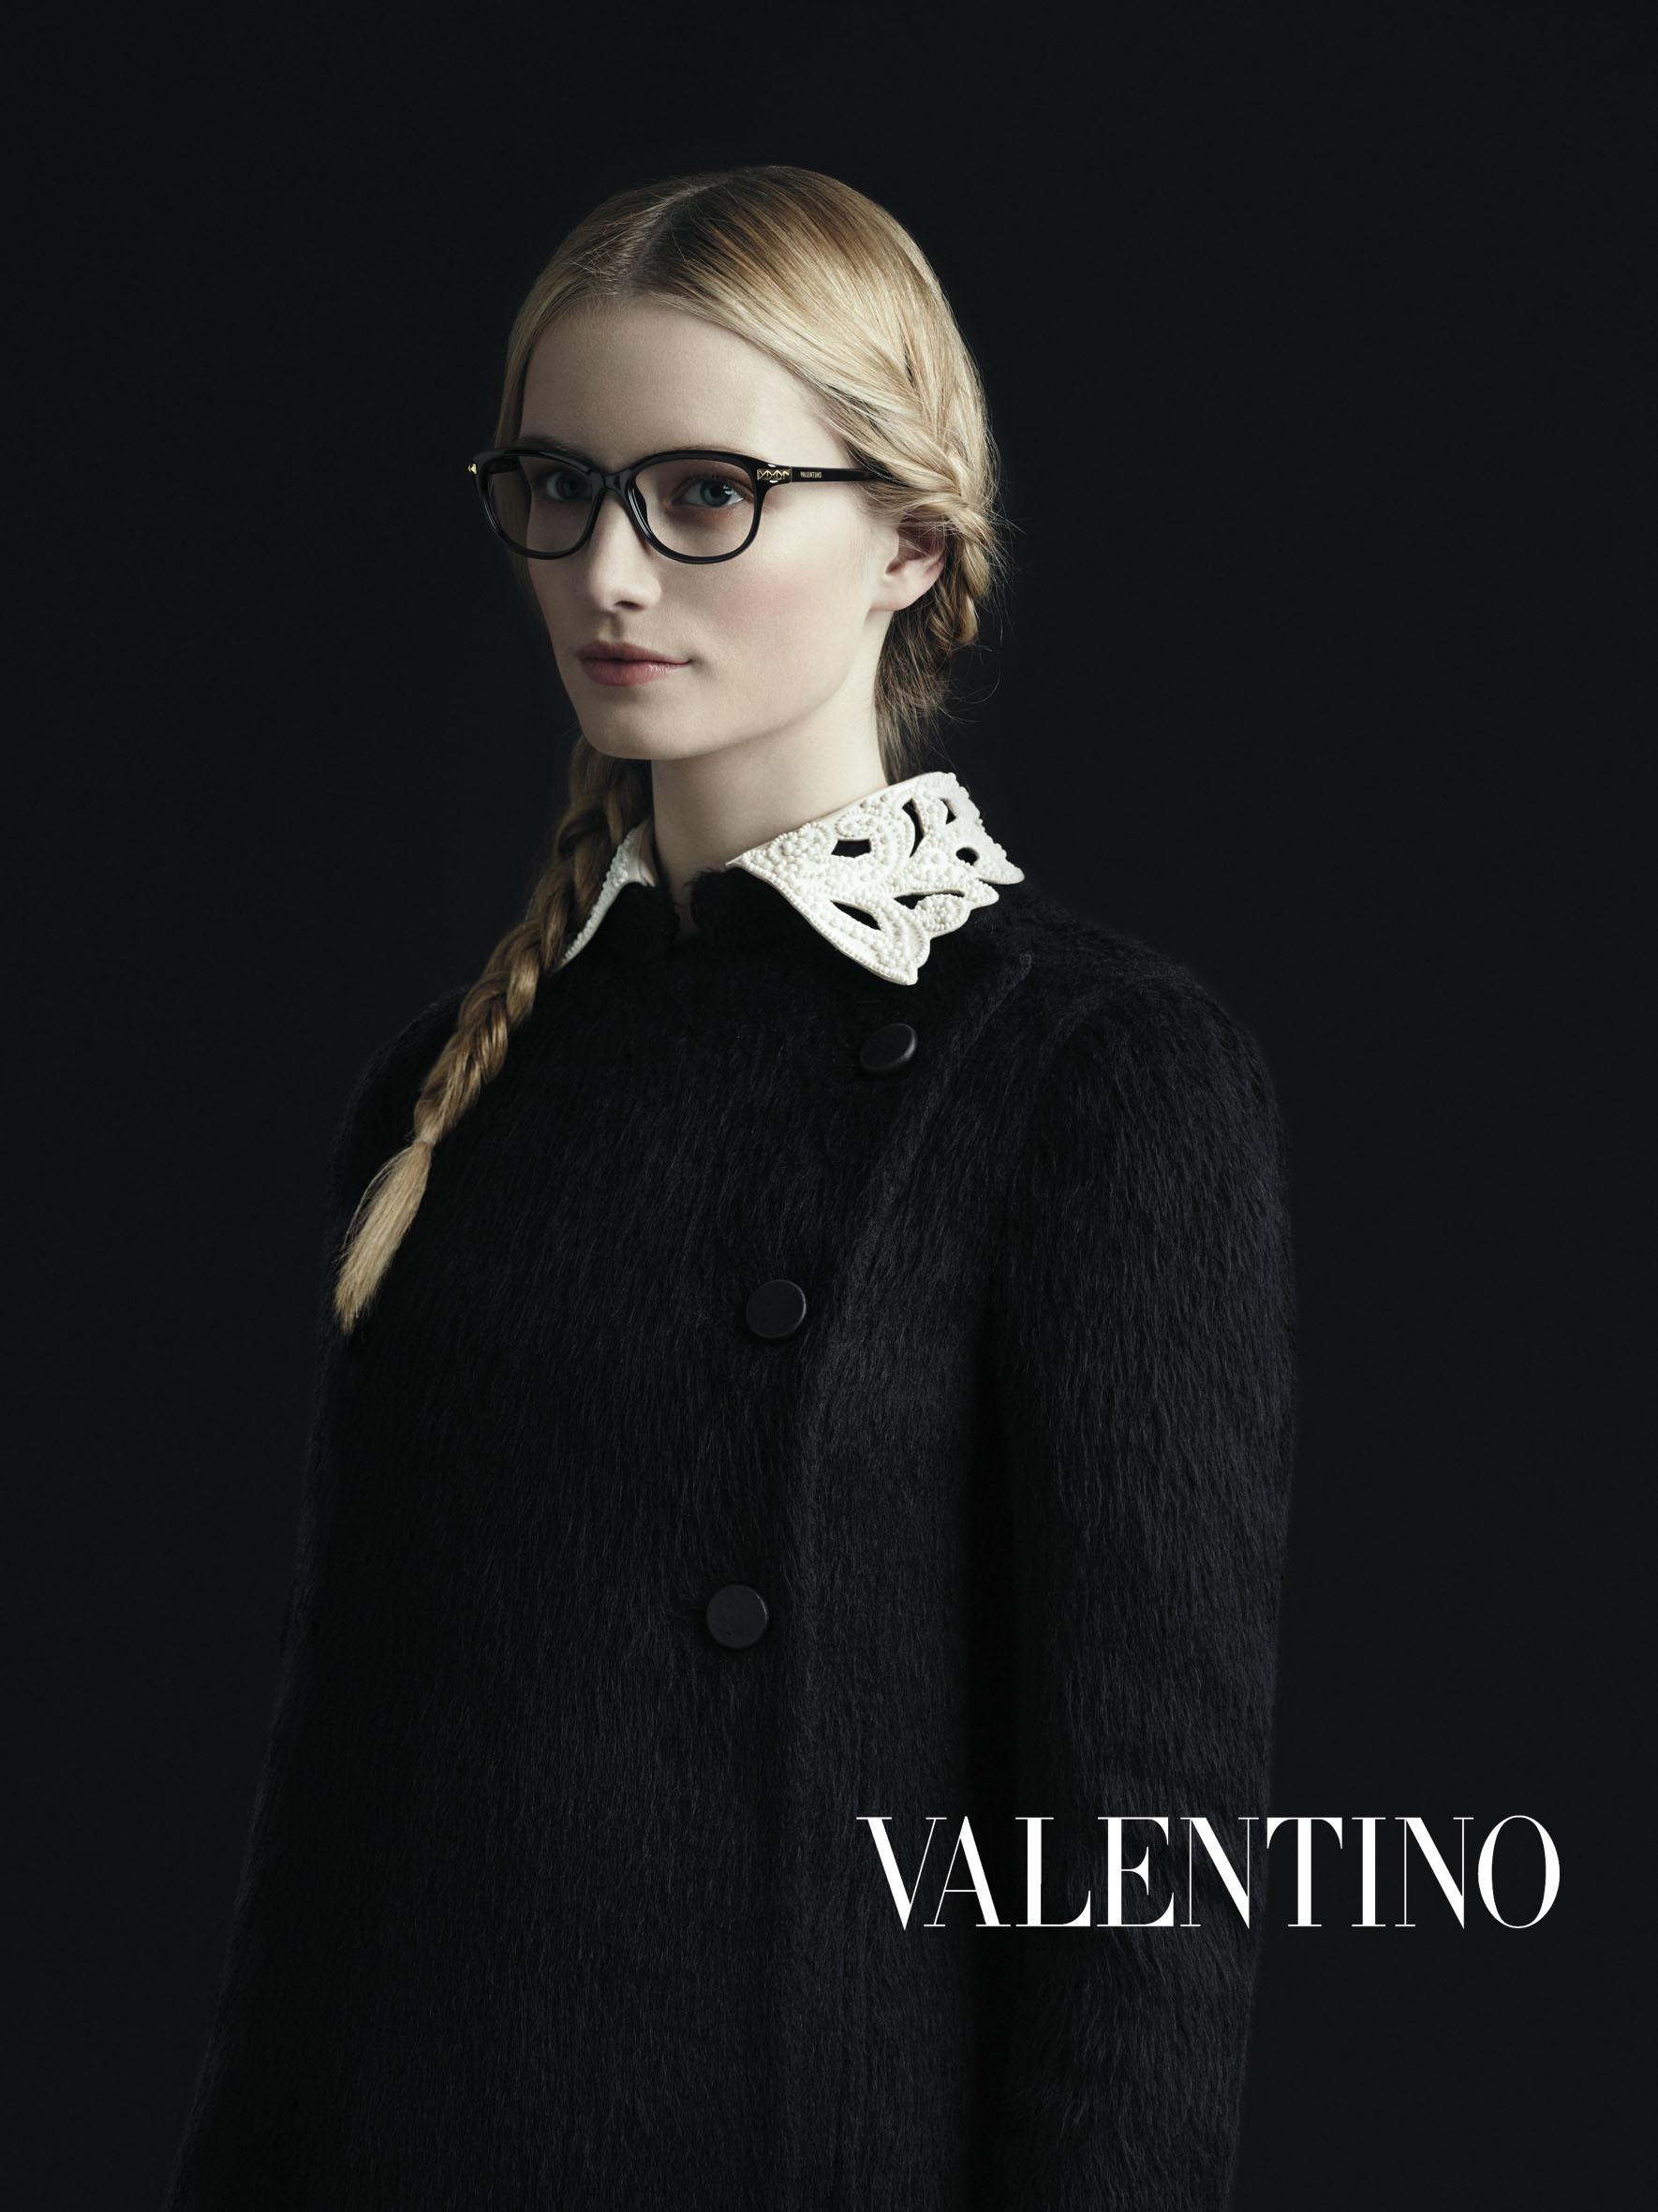 Valentino Eyewear FW 2013 | Pablo Arroyo | Valentino | Elle Decor | Giulio Martinelli | Numerique Retouch Photo Retouching Studio